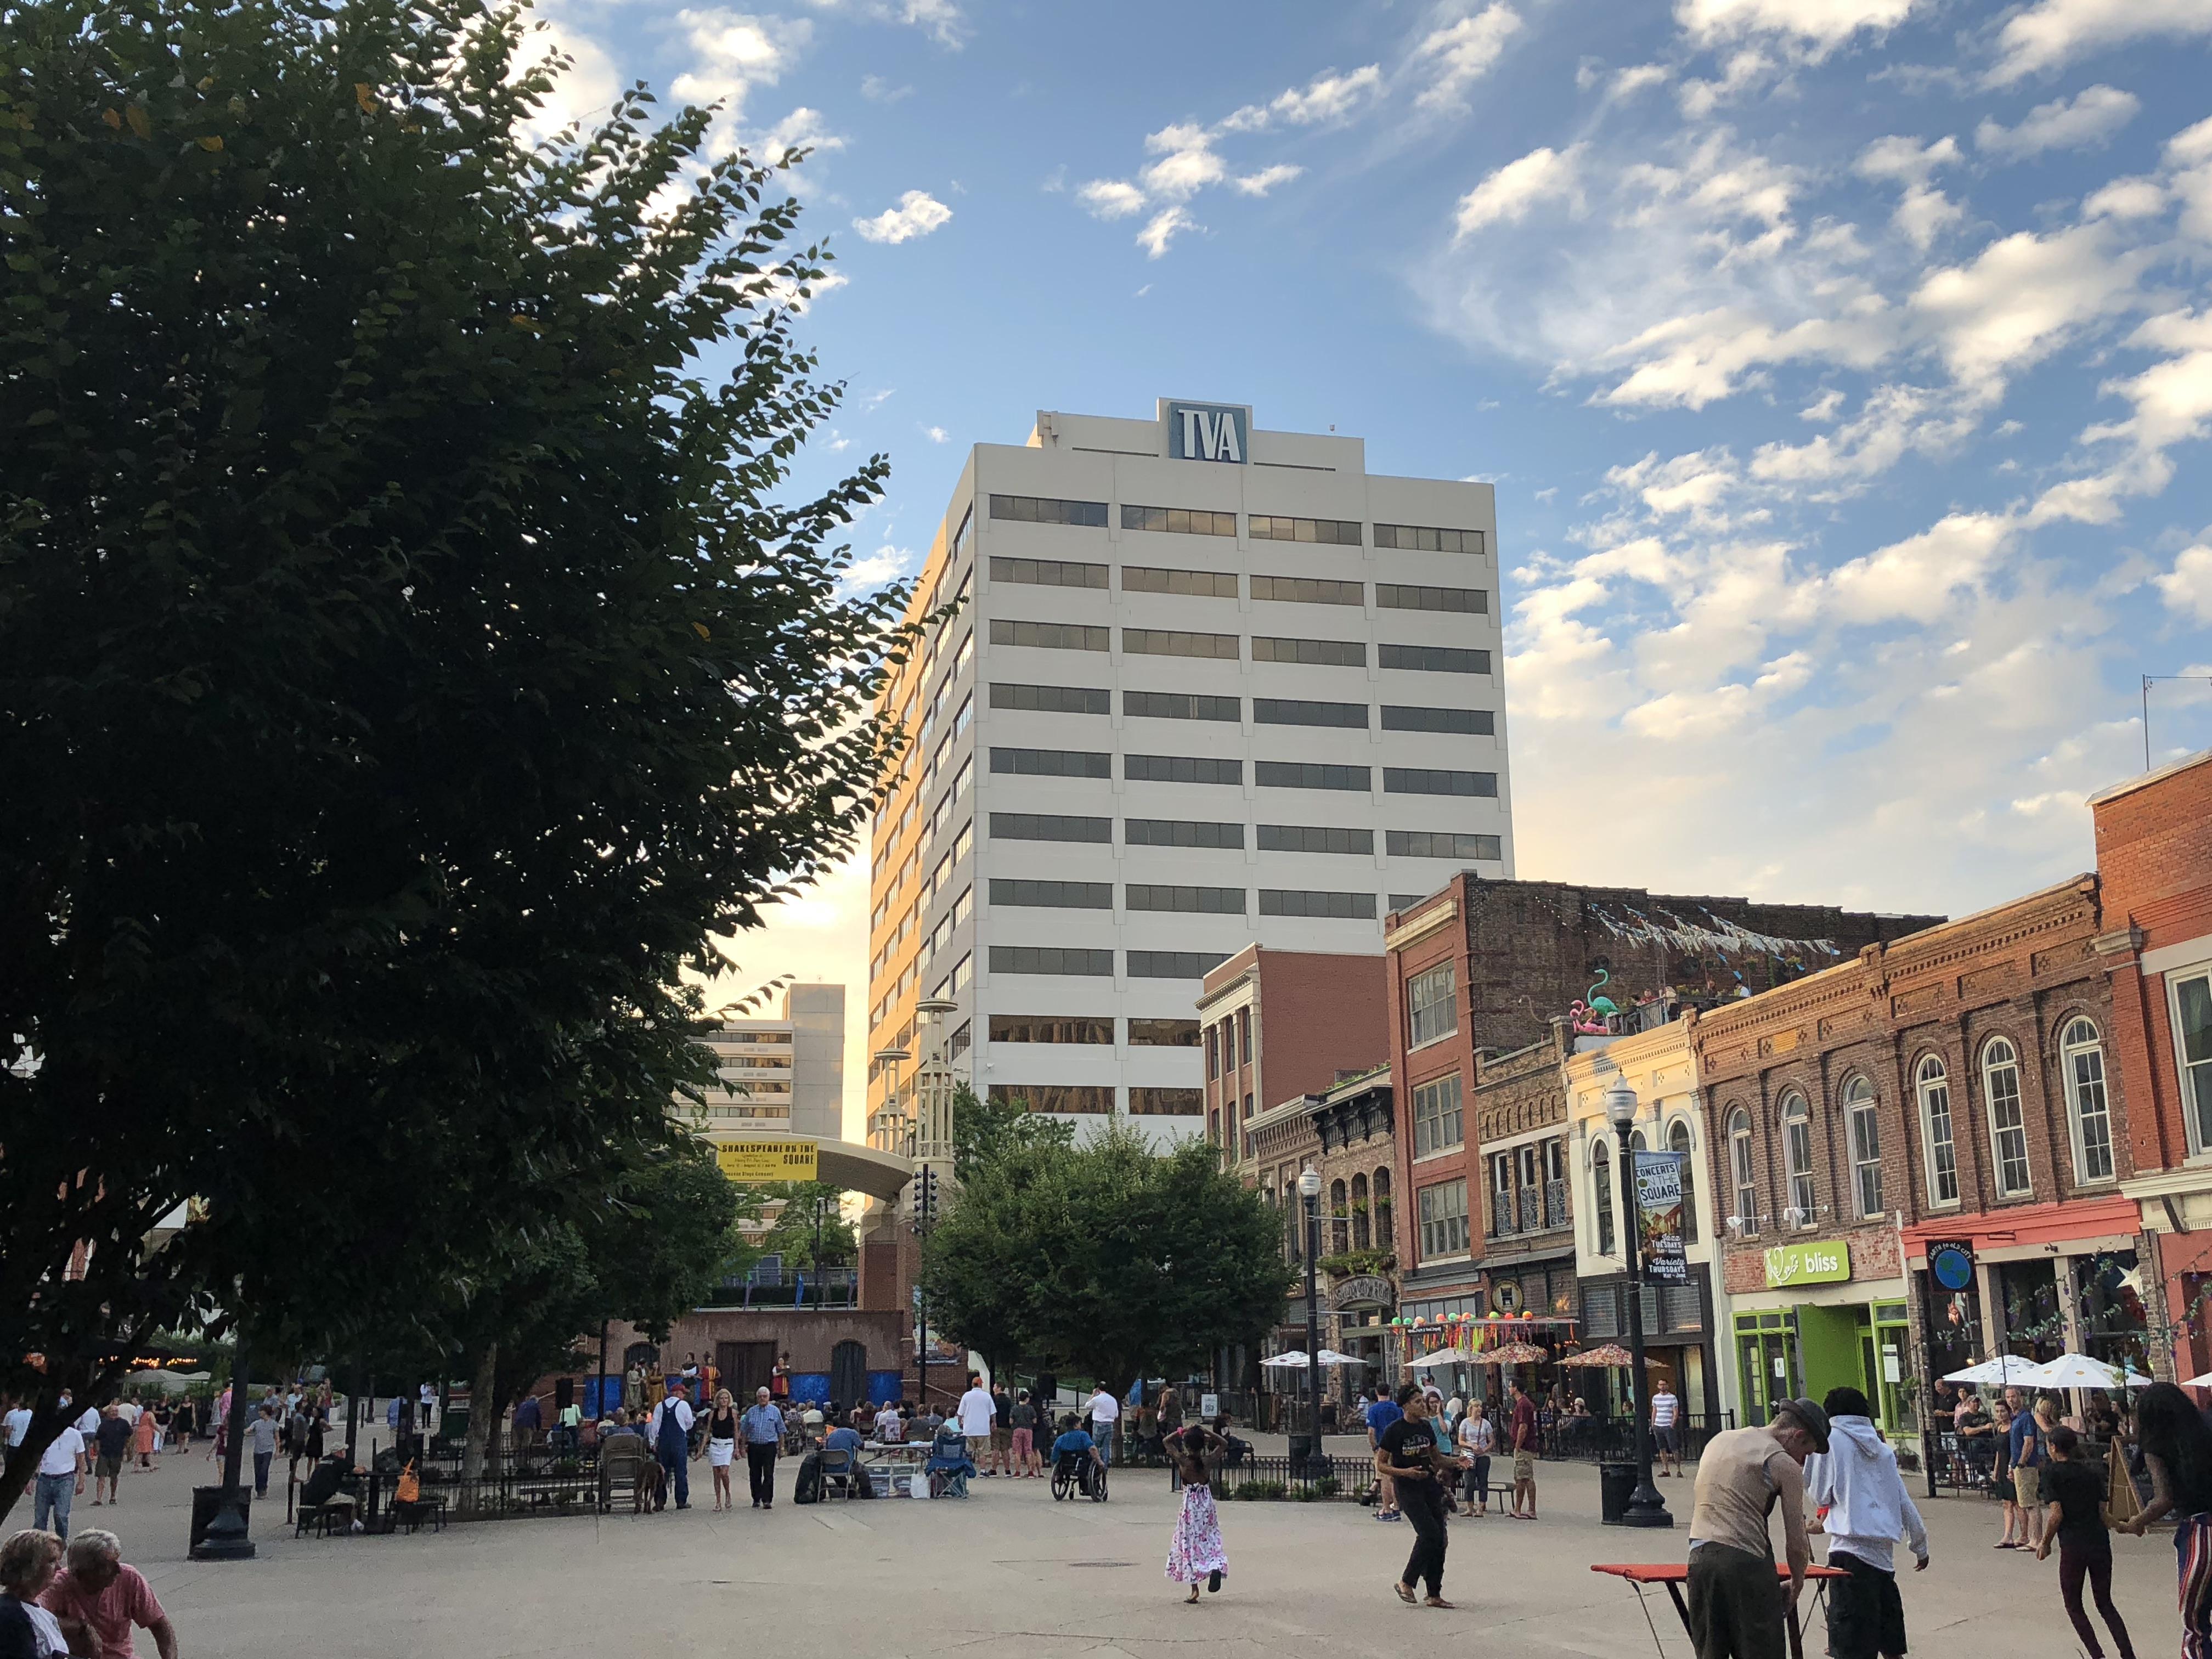 Market Square 3